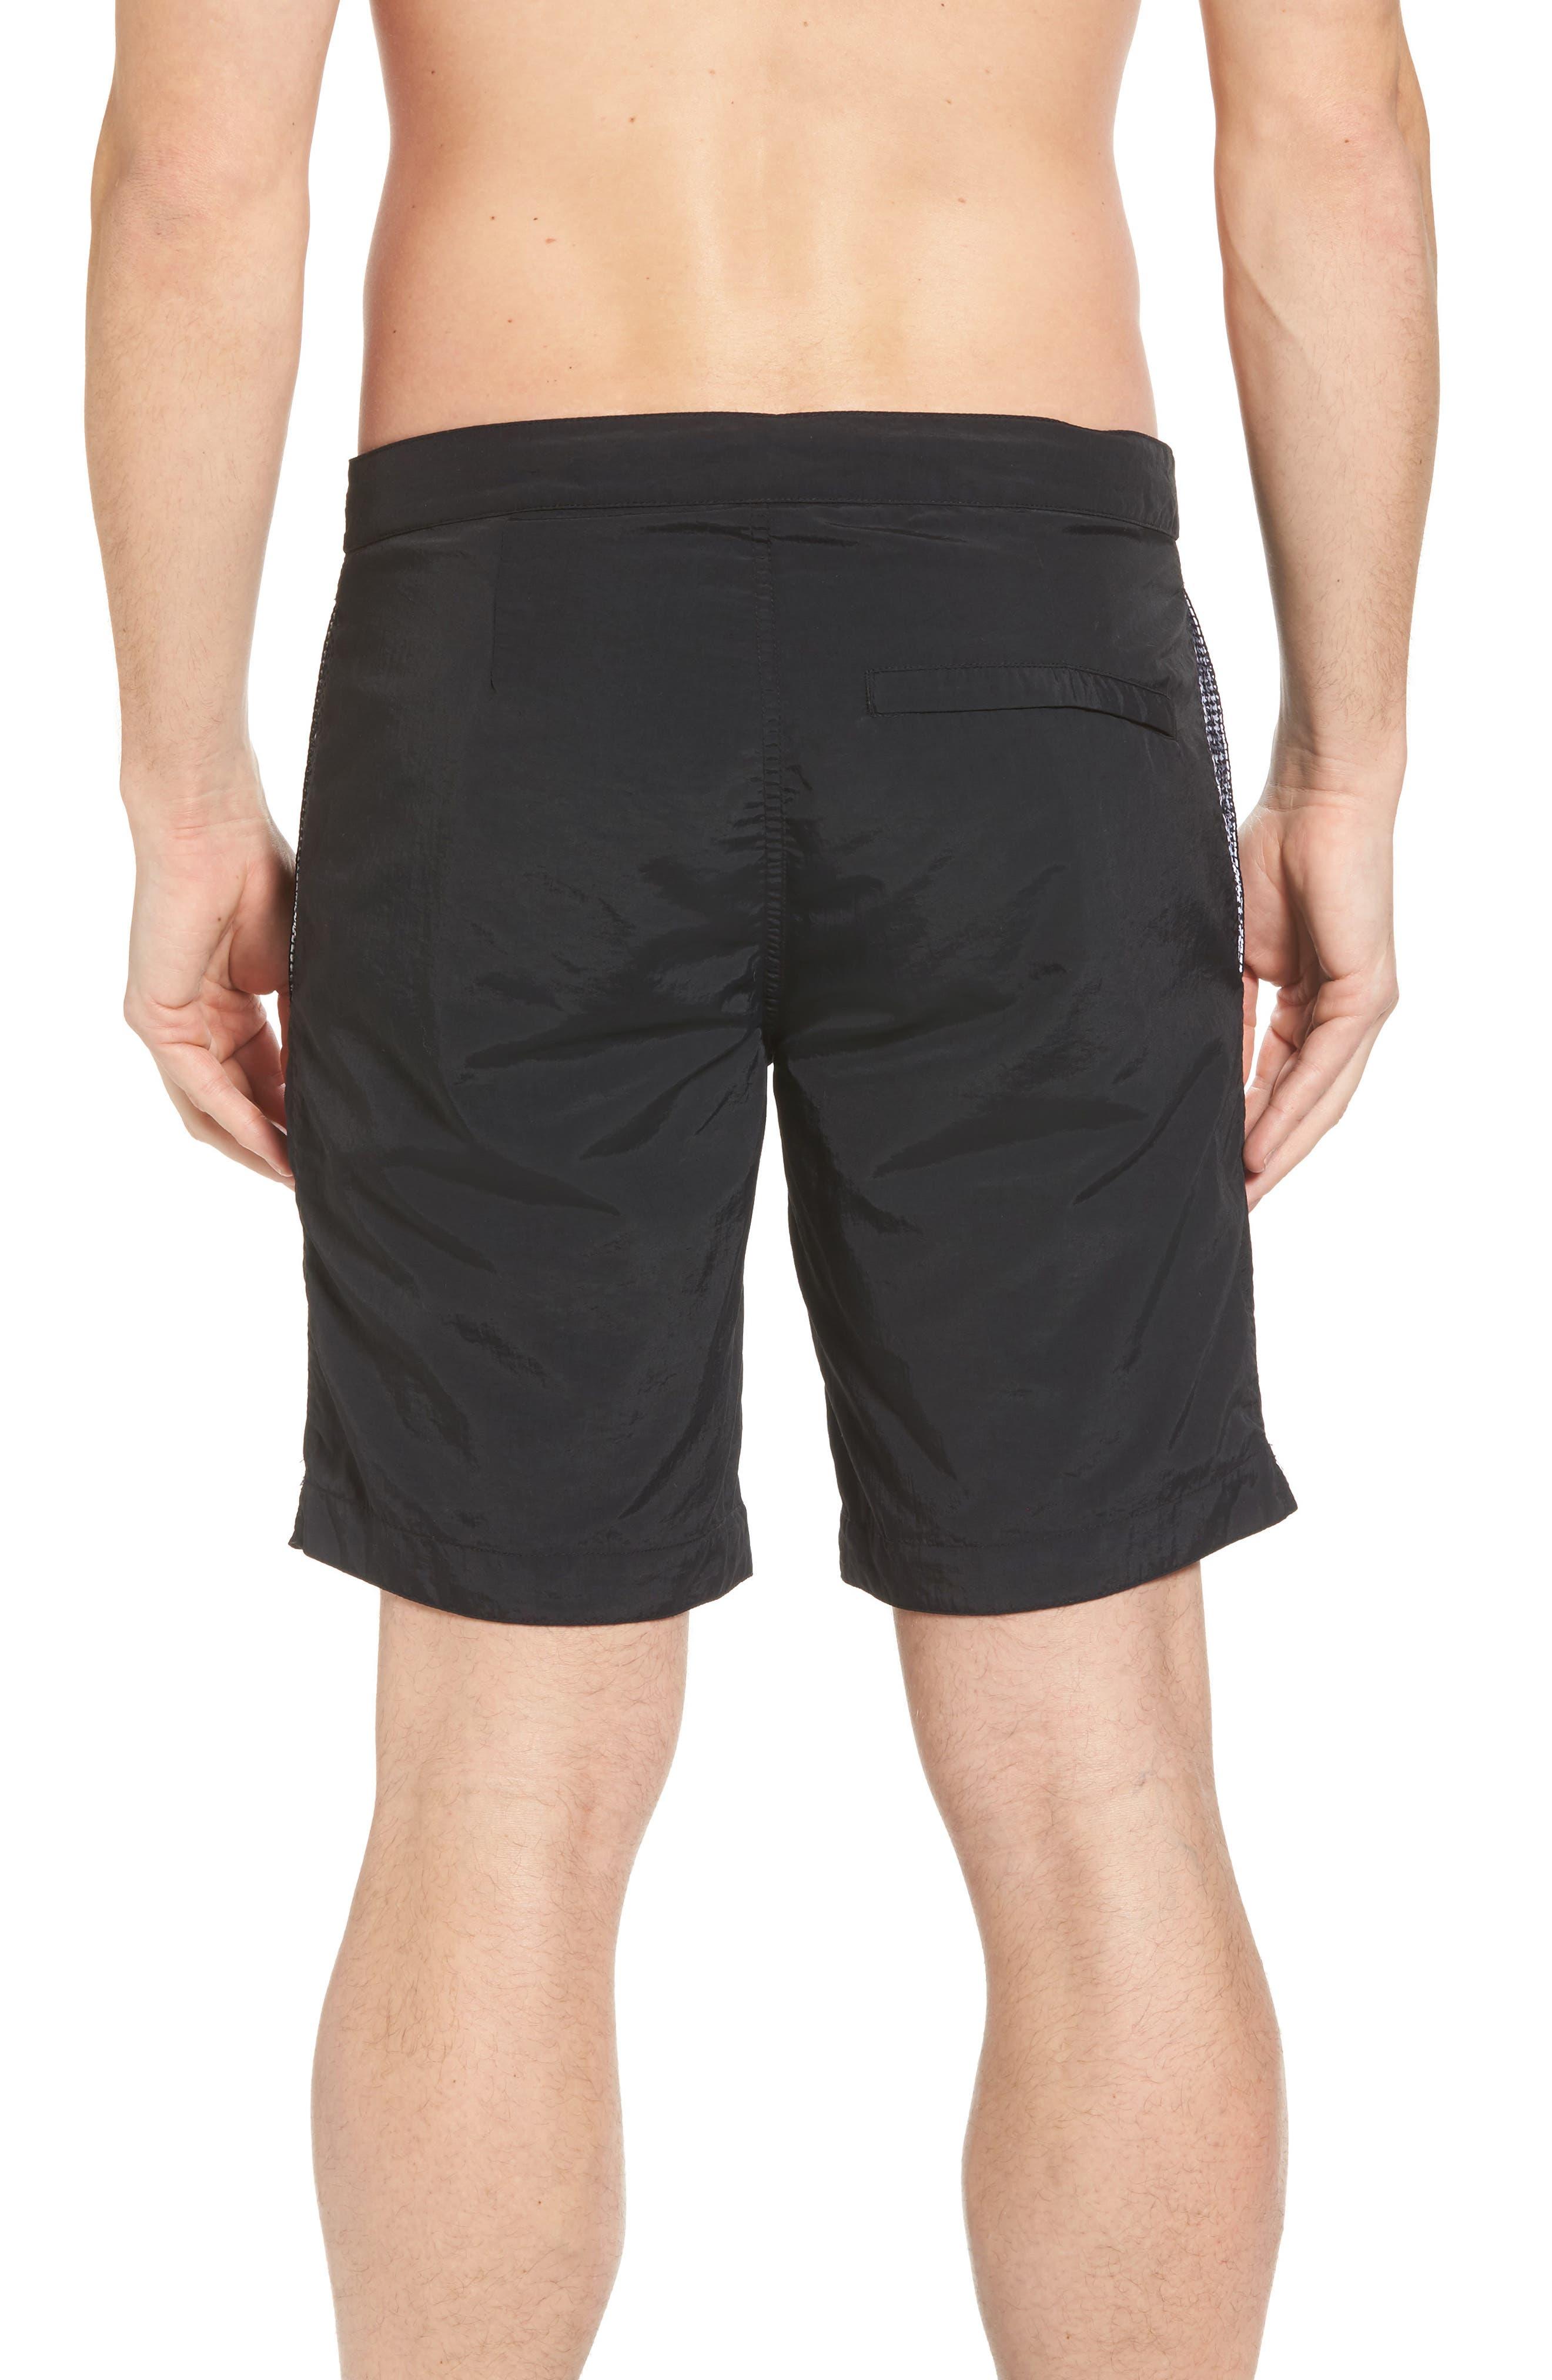 'Aruba - Island' Tailored Fit 8.5 Inch Board Shorts,                             Alternate thumbnail 2, color,                             001